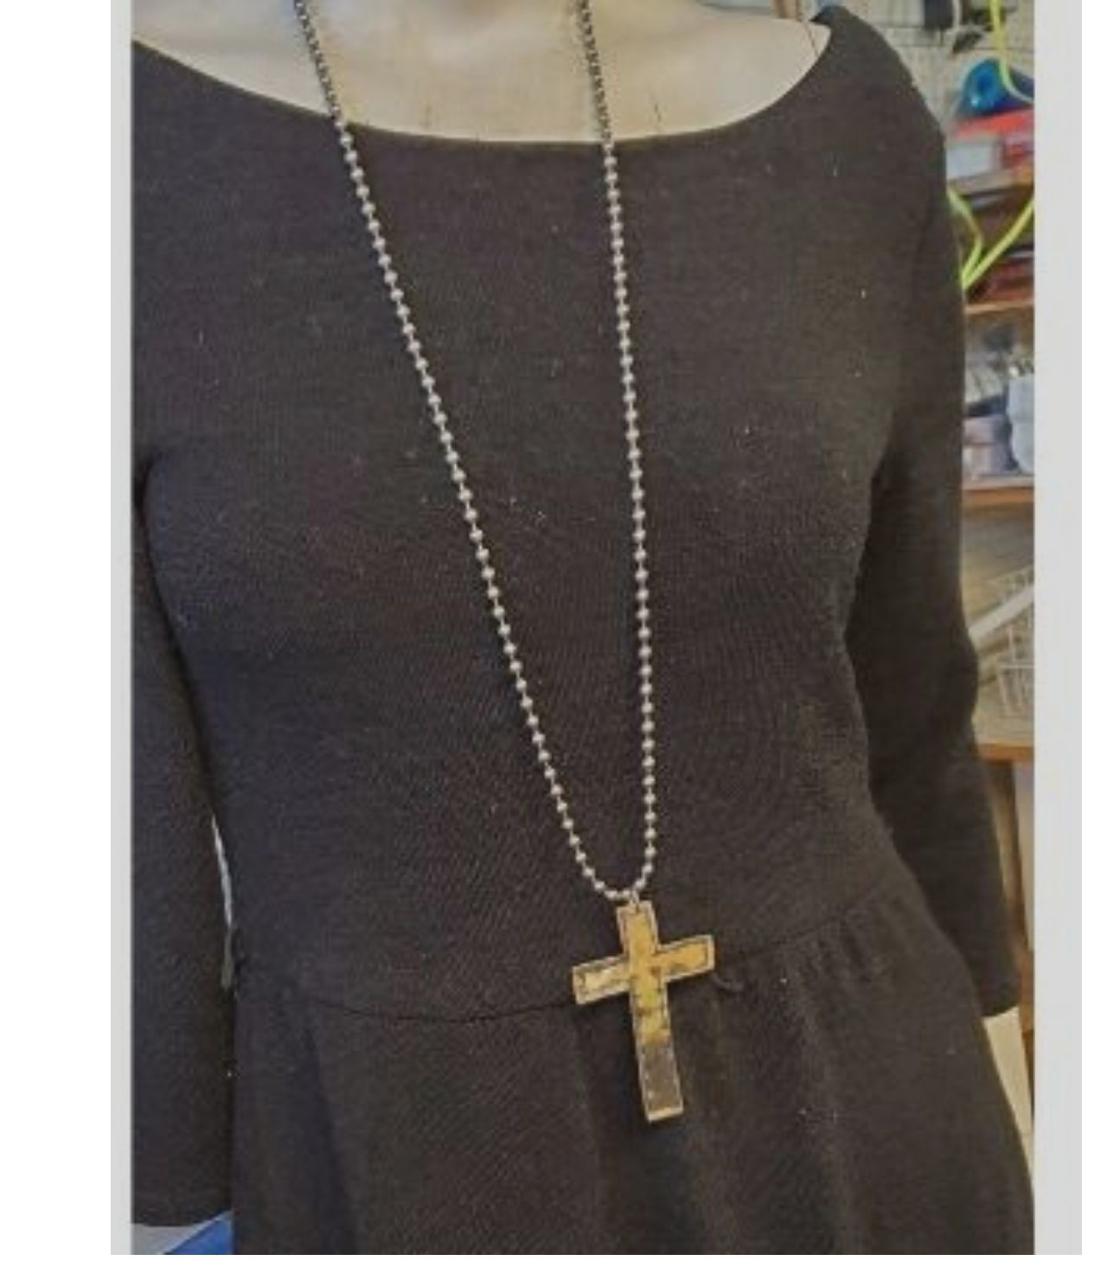 big-brass-cross-statement-necklace-on-black dress